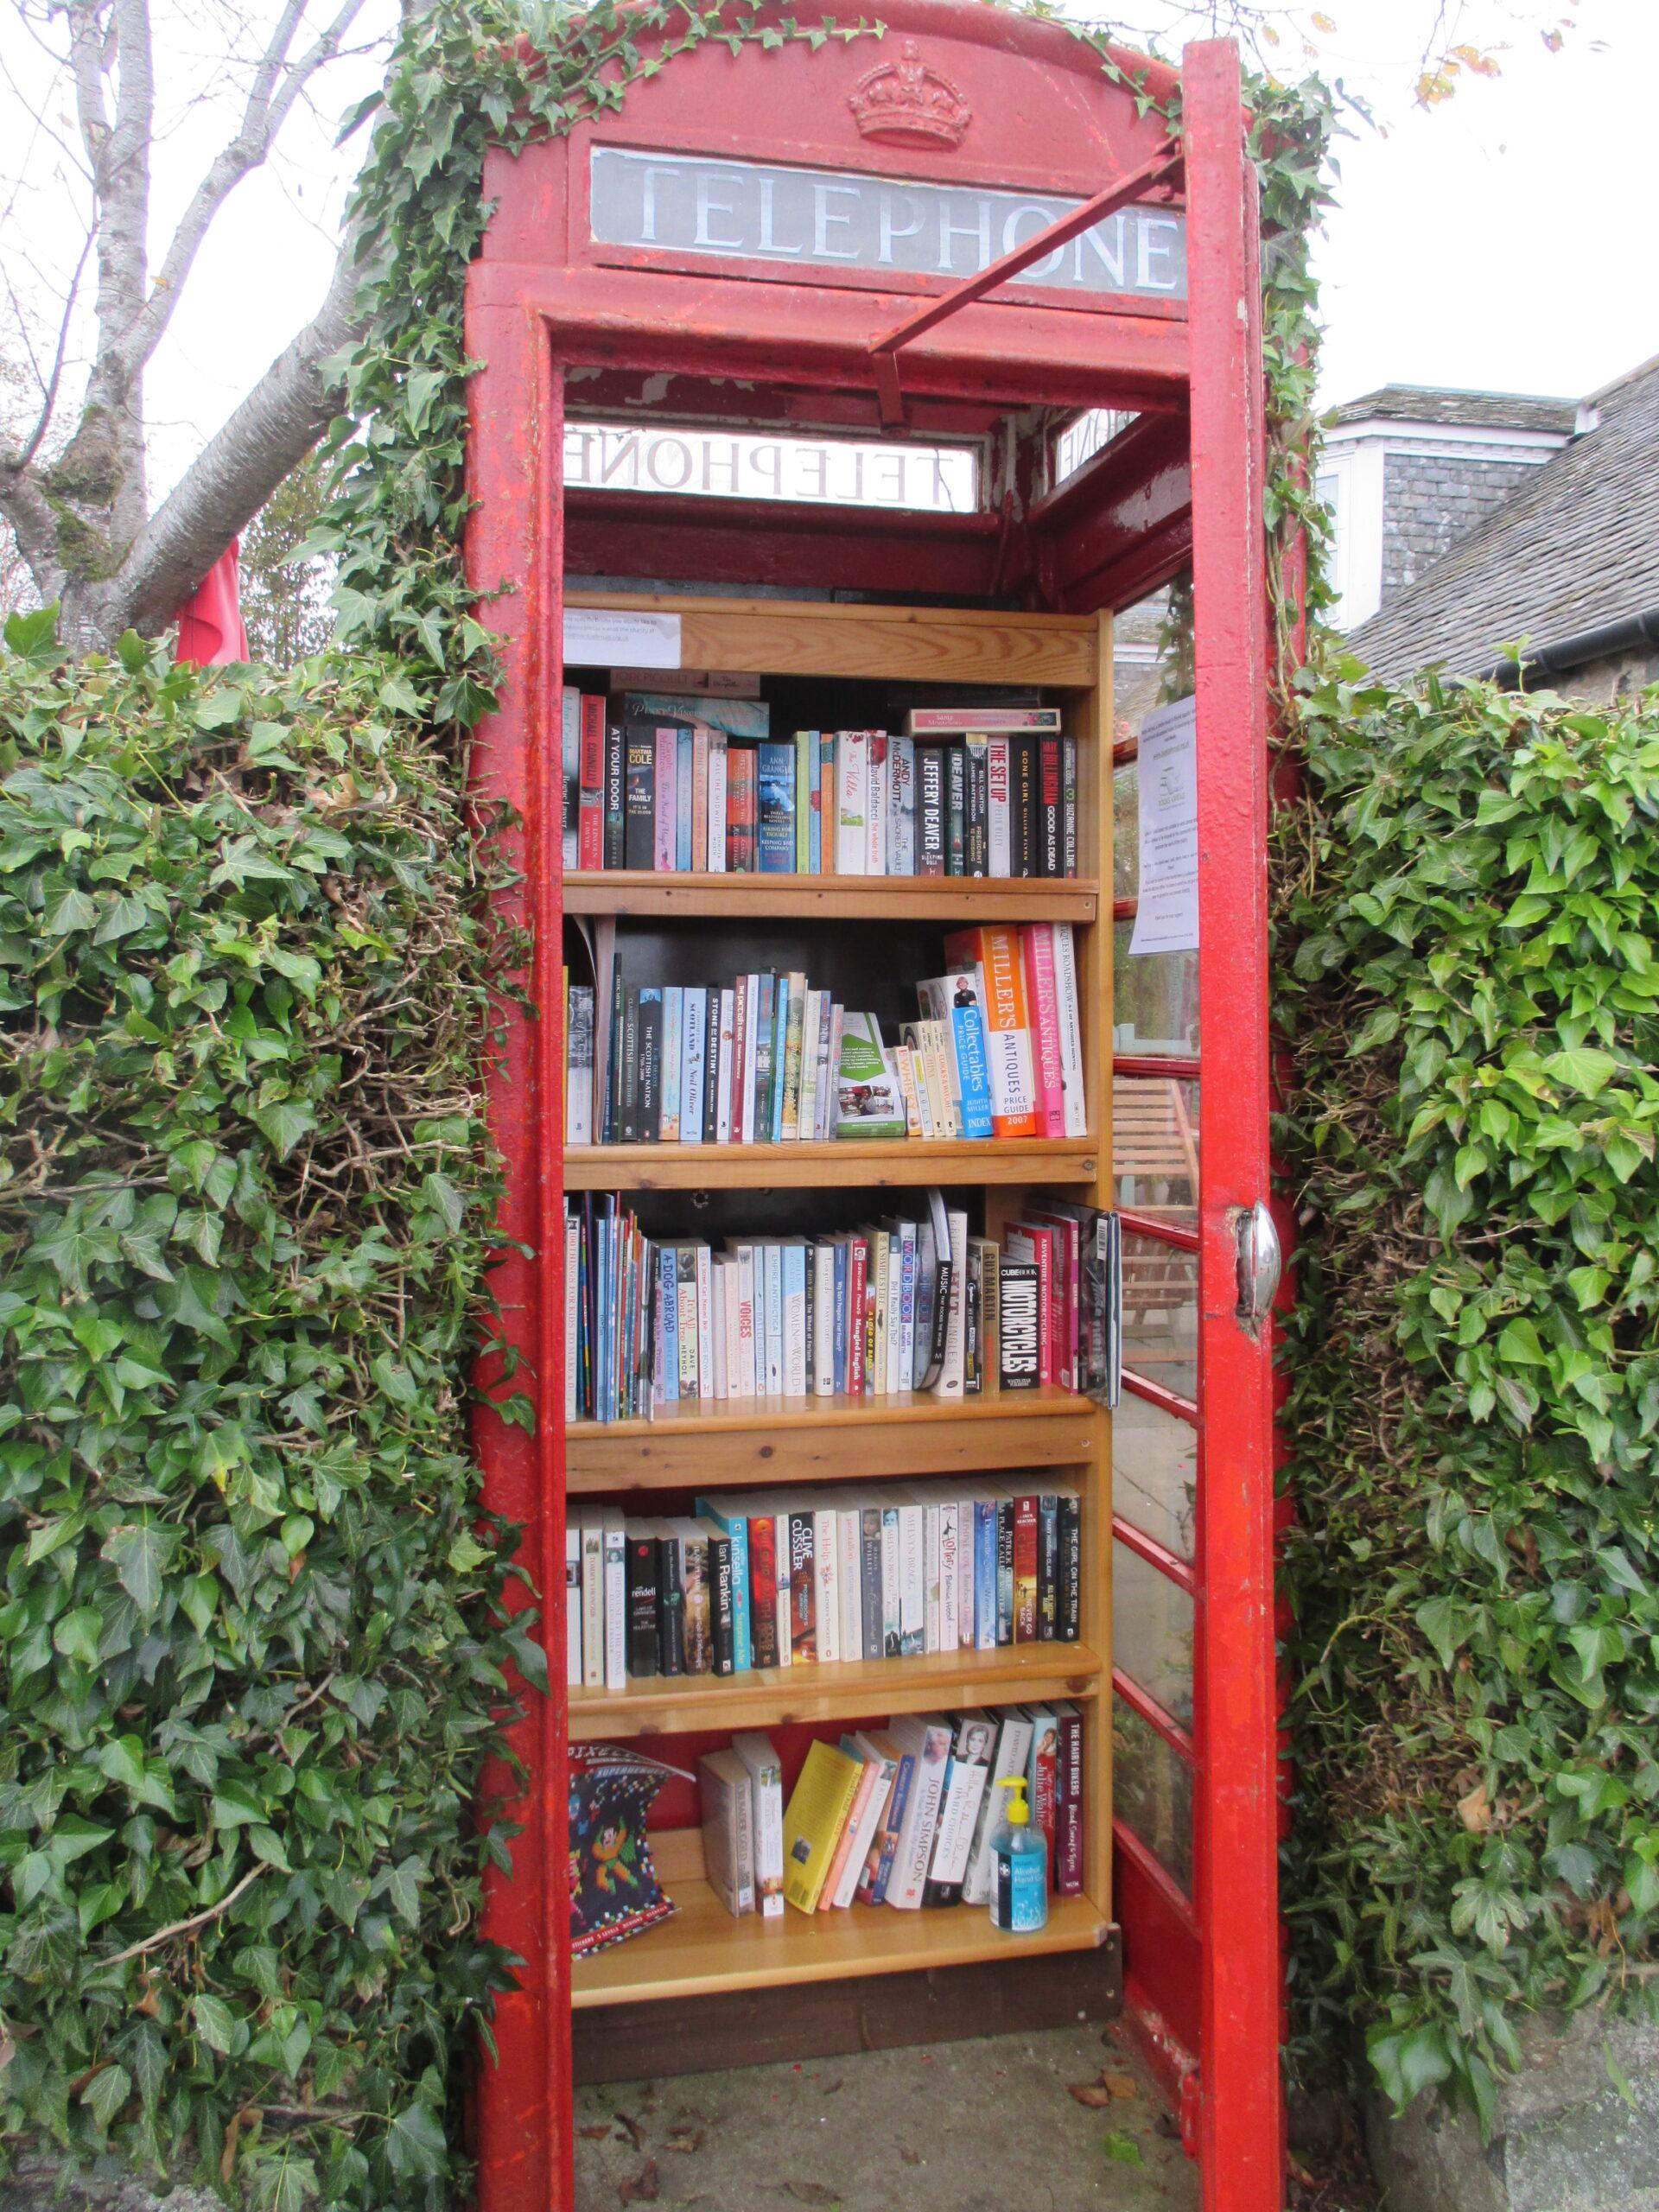 Mini Library in phone box